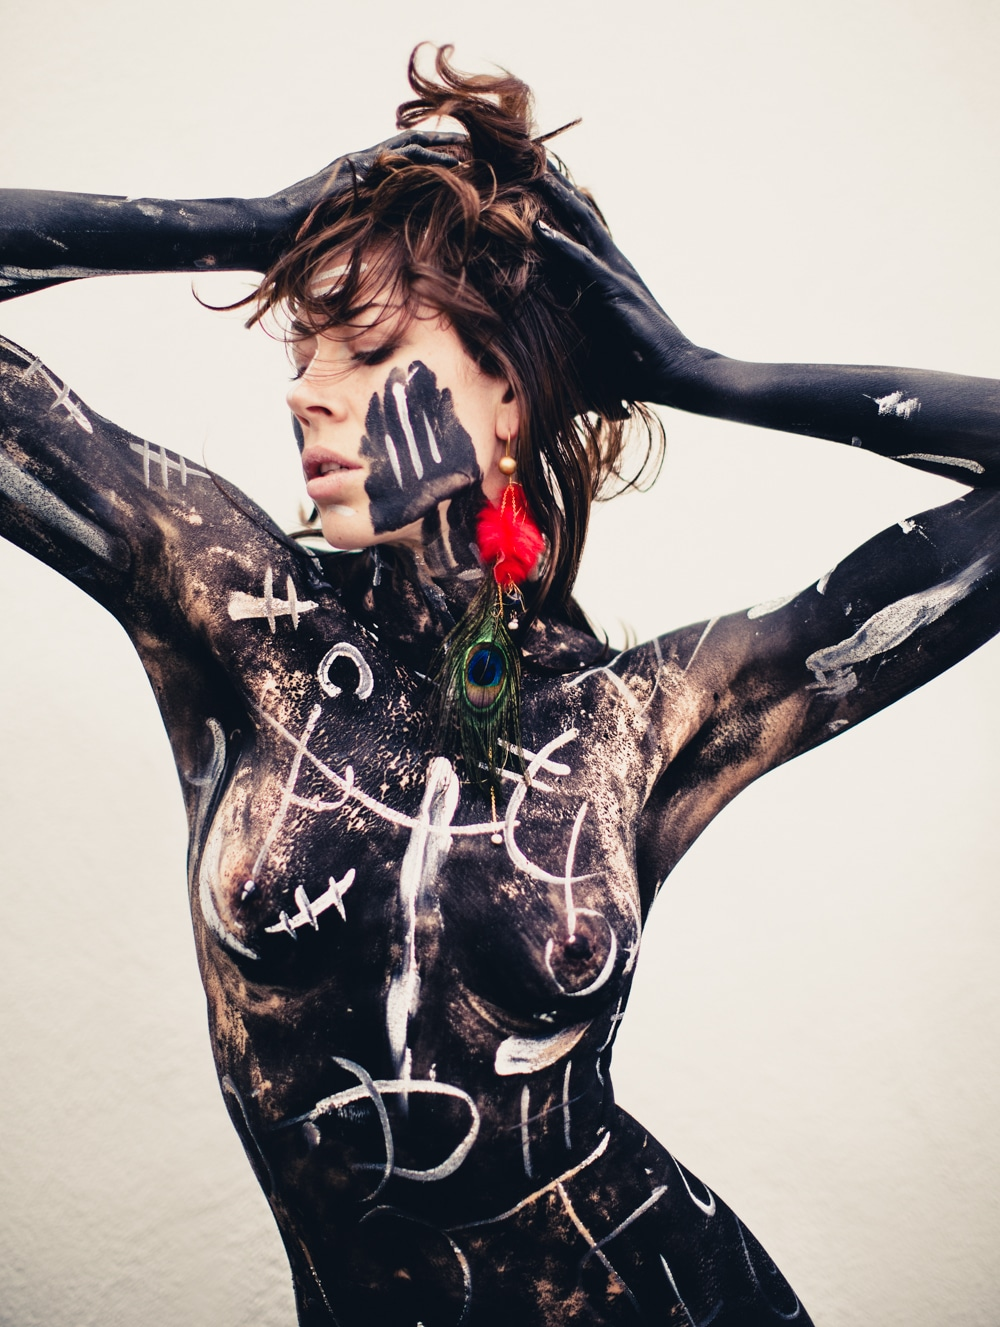 primal_fashion_by_gregory_beylerian-13